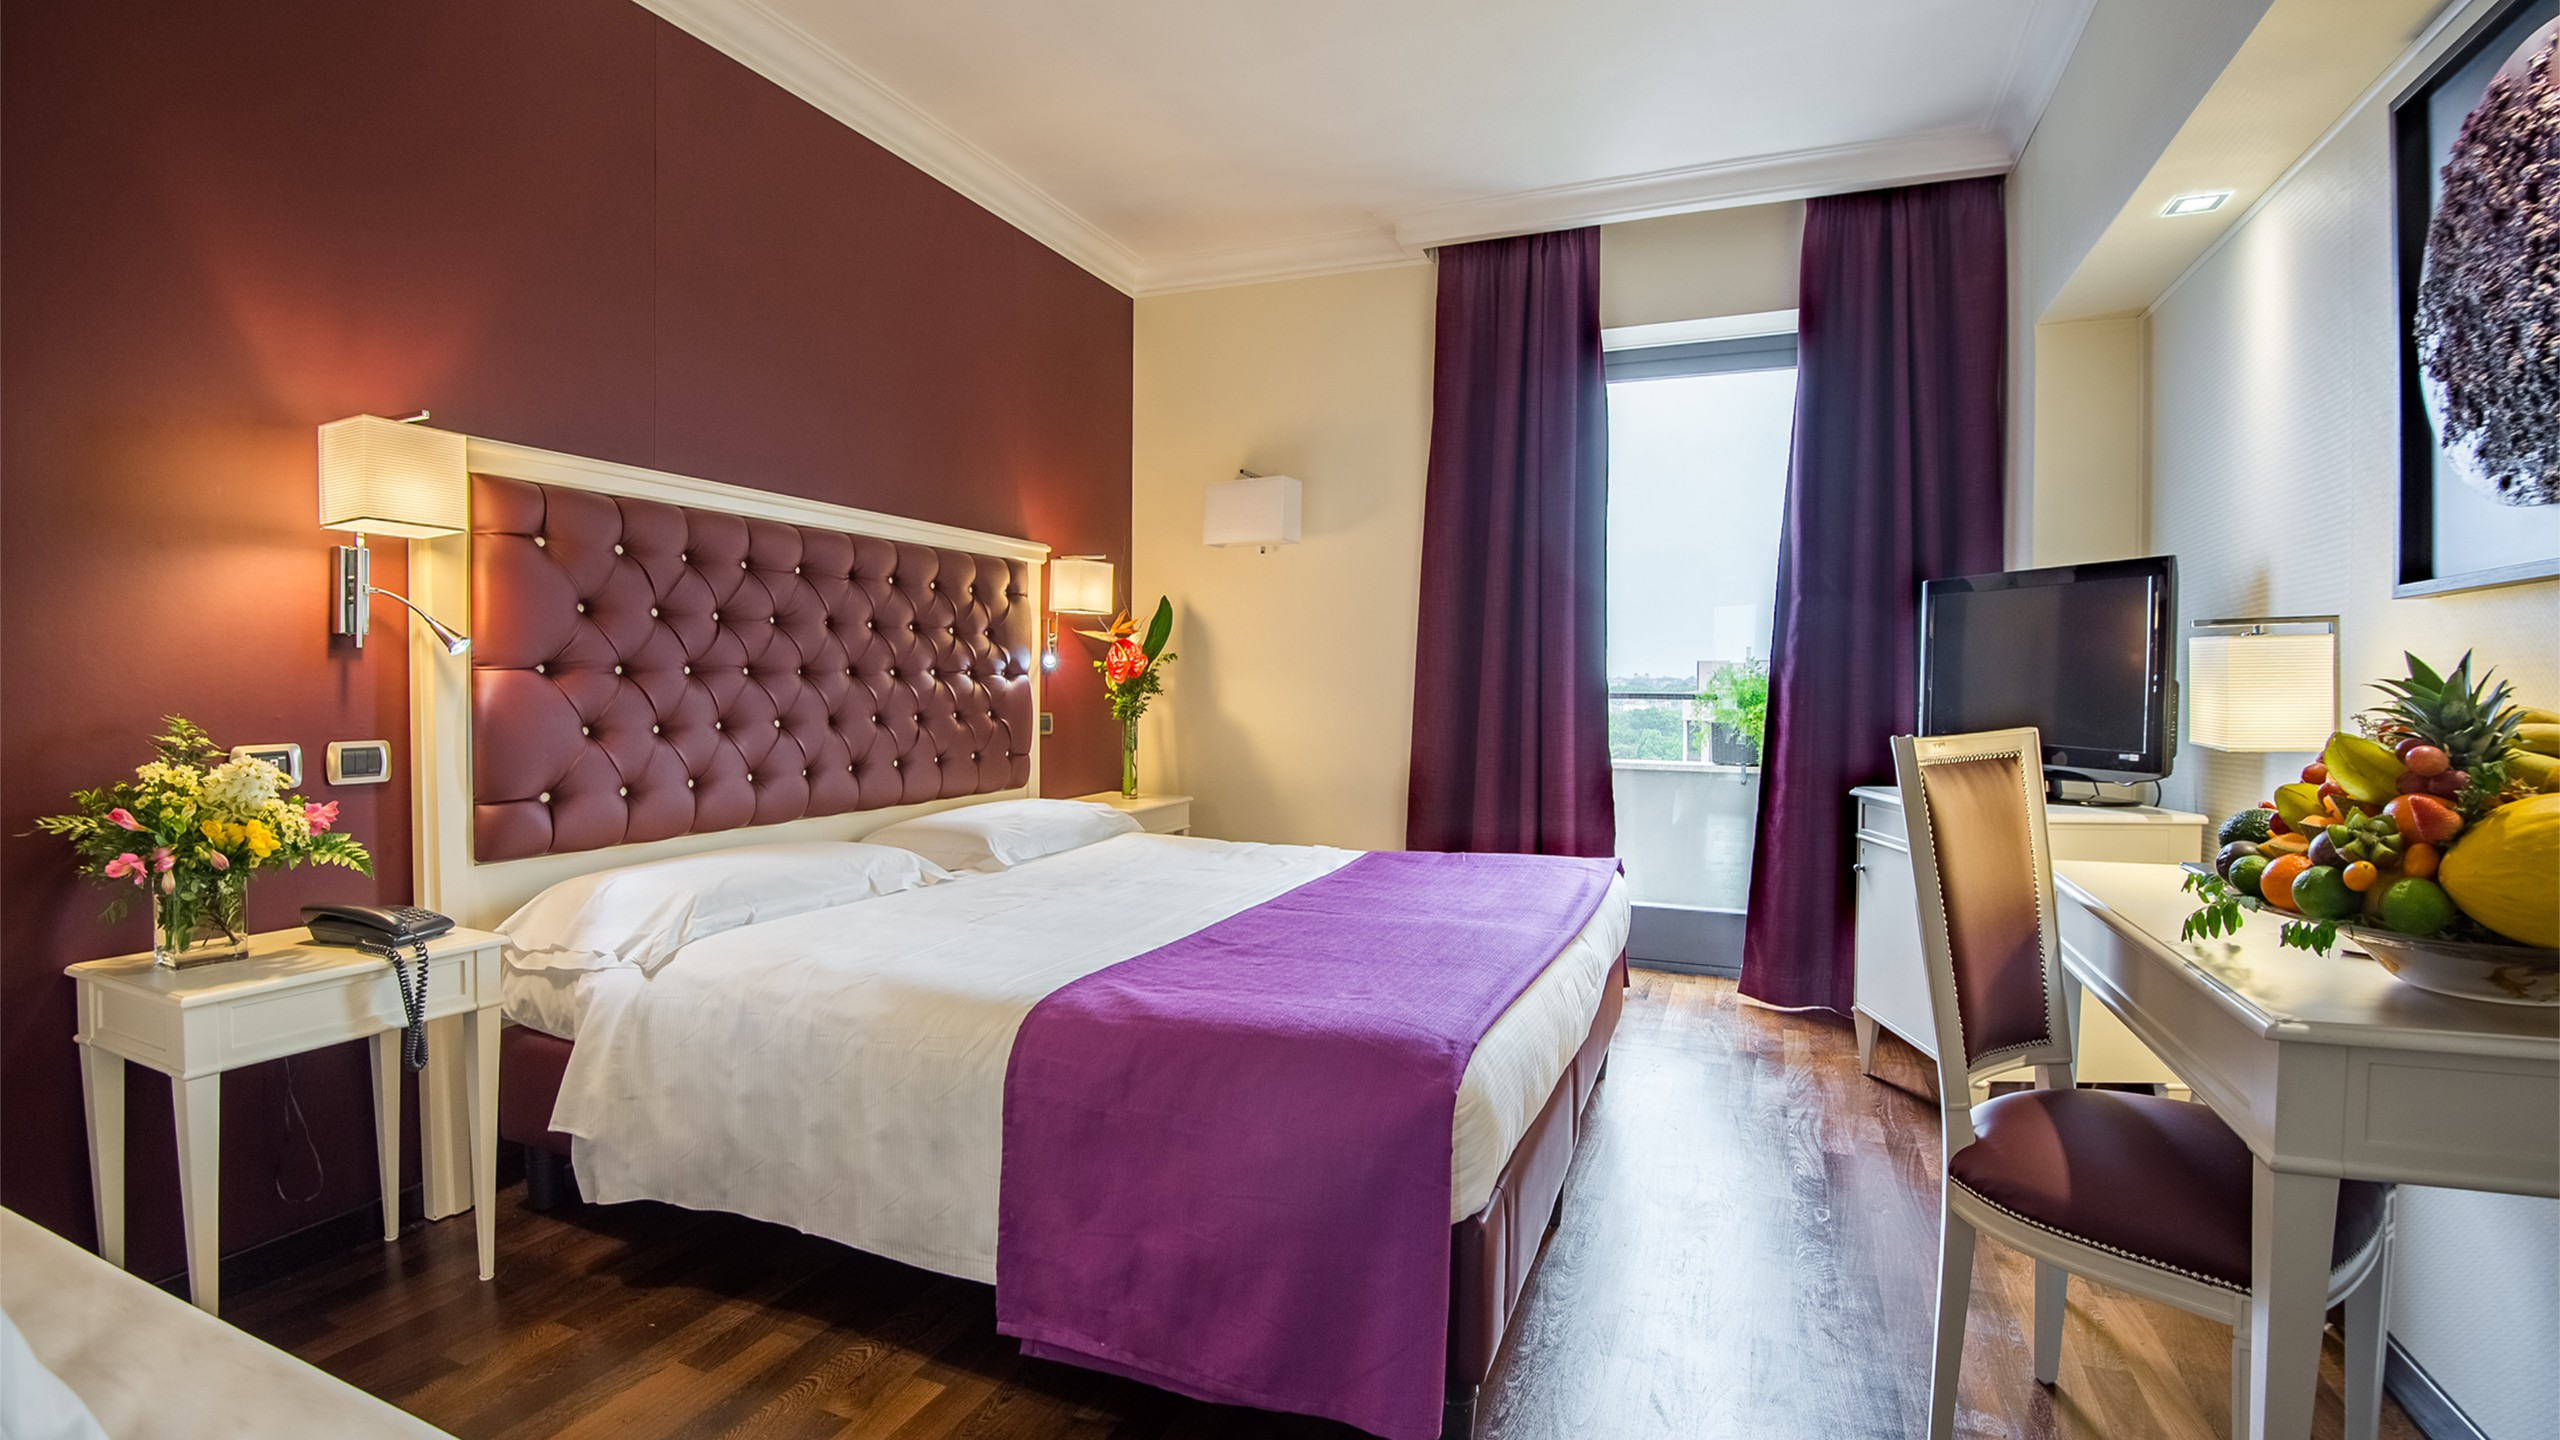 Hotel-Trilussa-Palace-camera-104